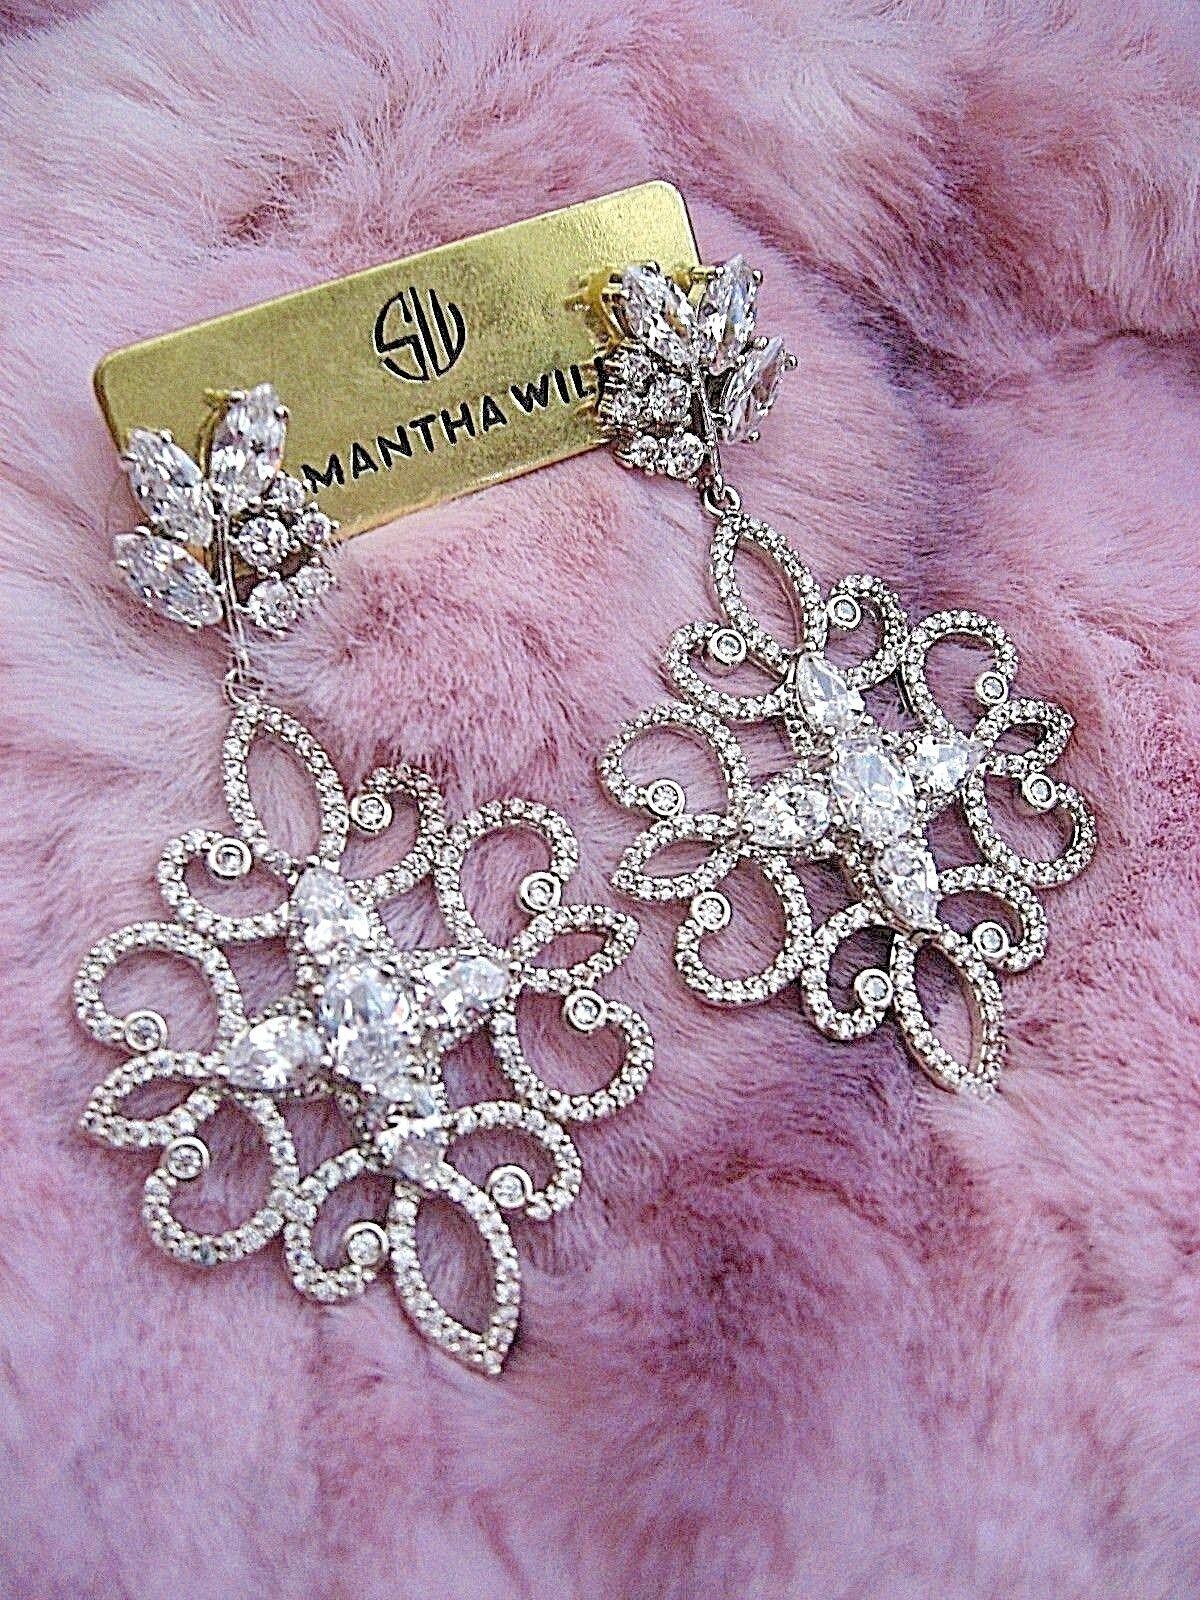 Samantha Wills Earrings Bridal Crystal Pave Dangle Dark Romance Grand NWT  219